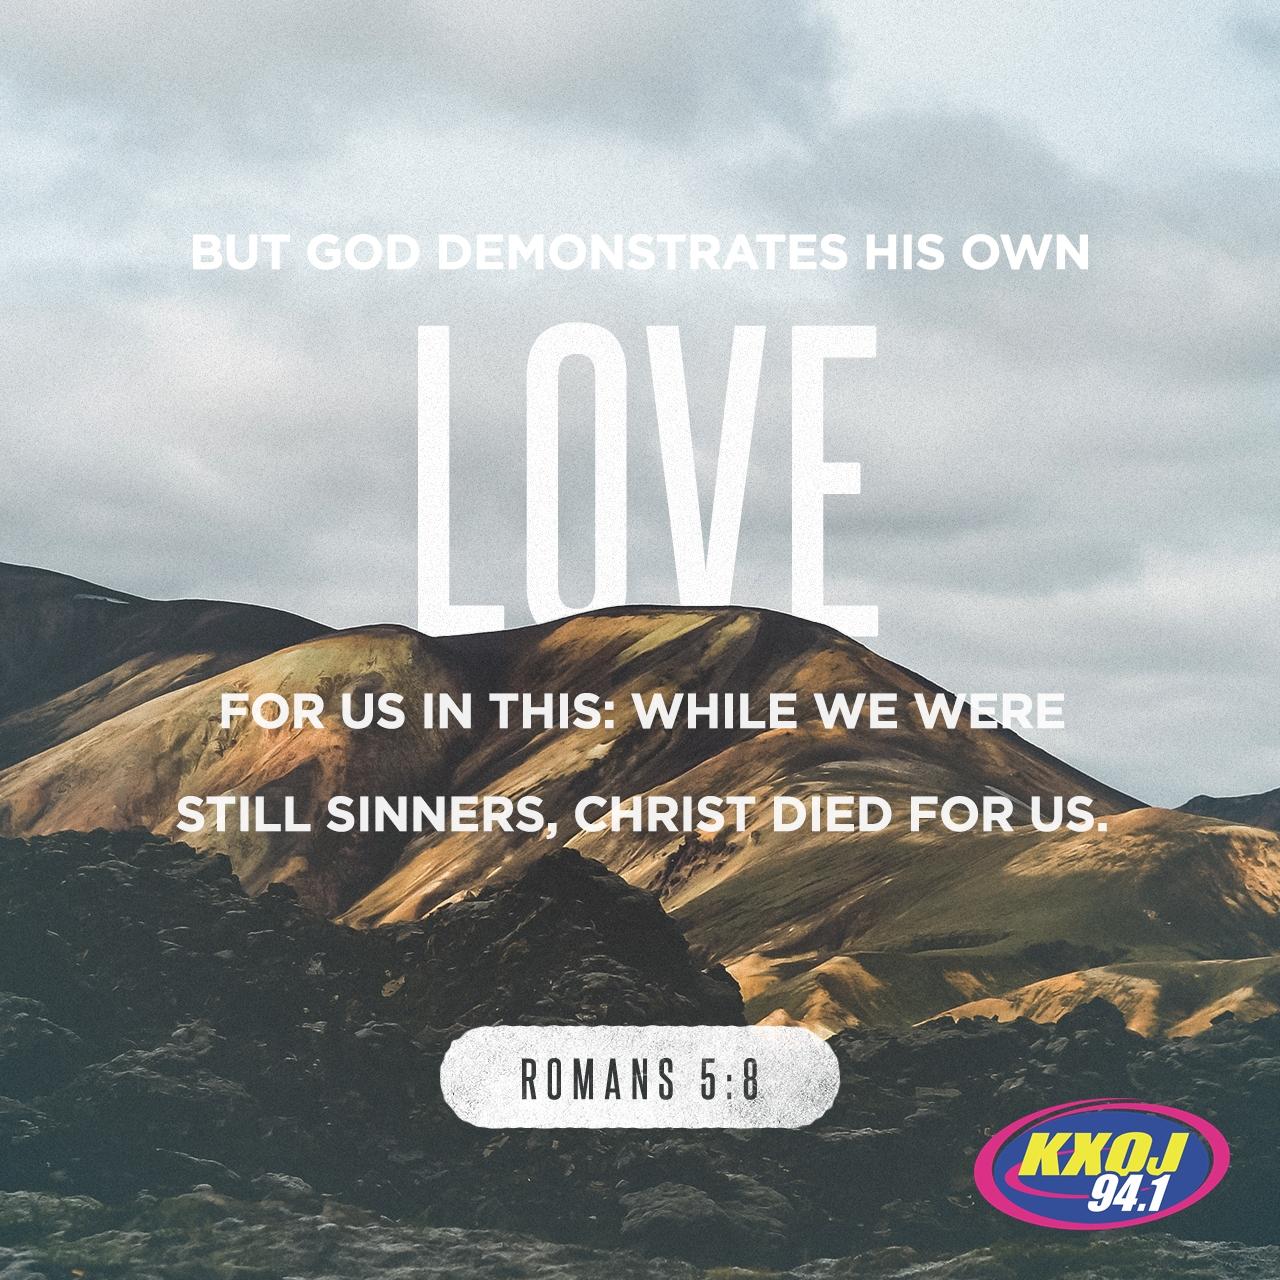 March 18th - Romans 5:8